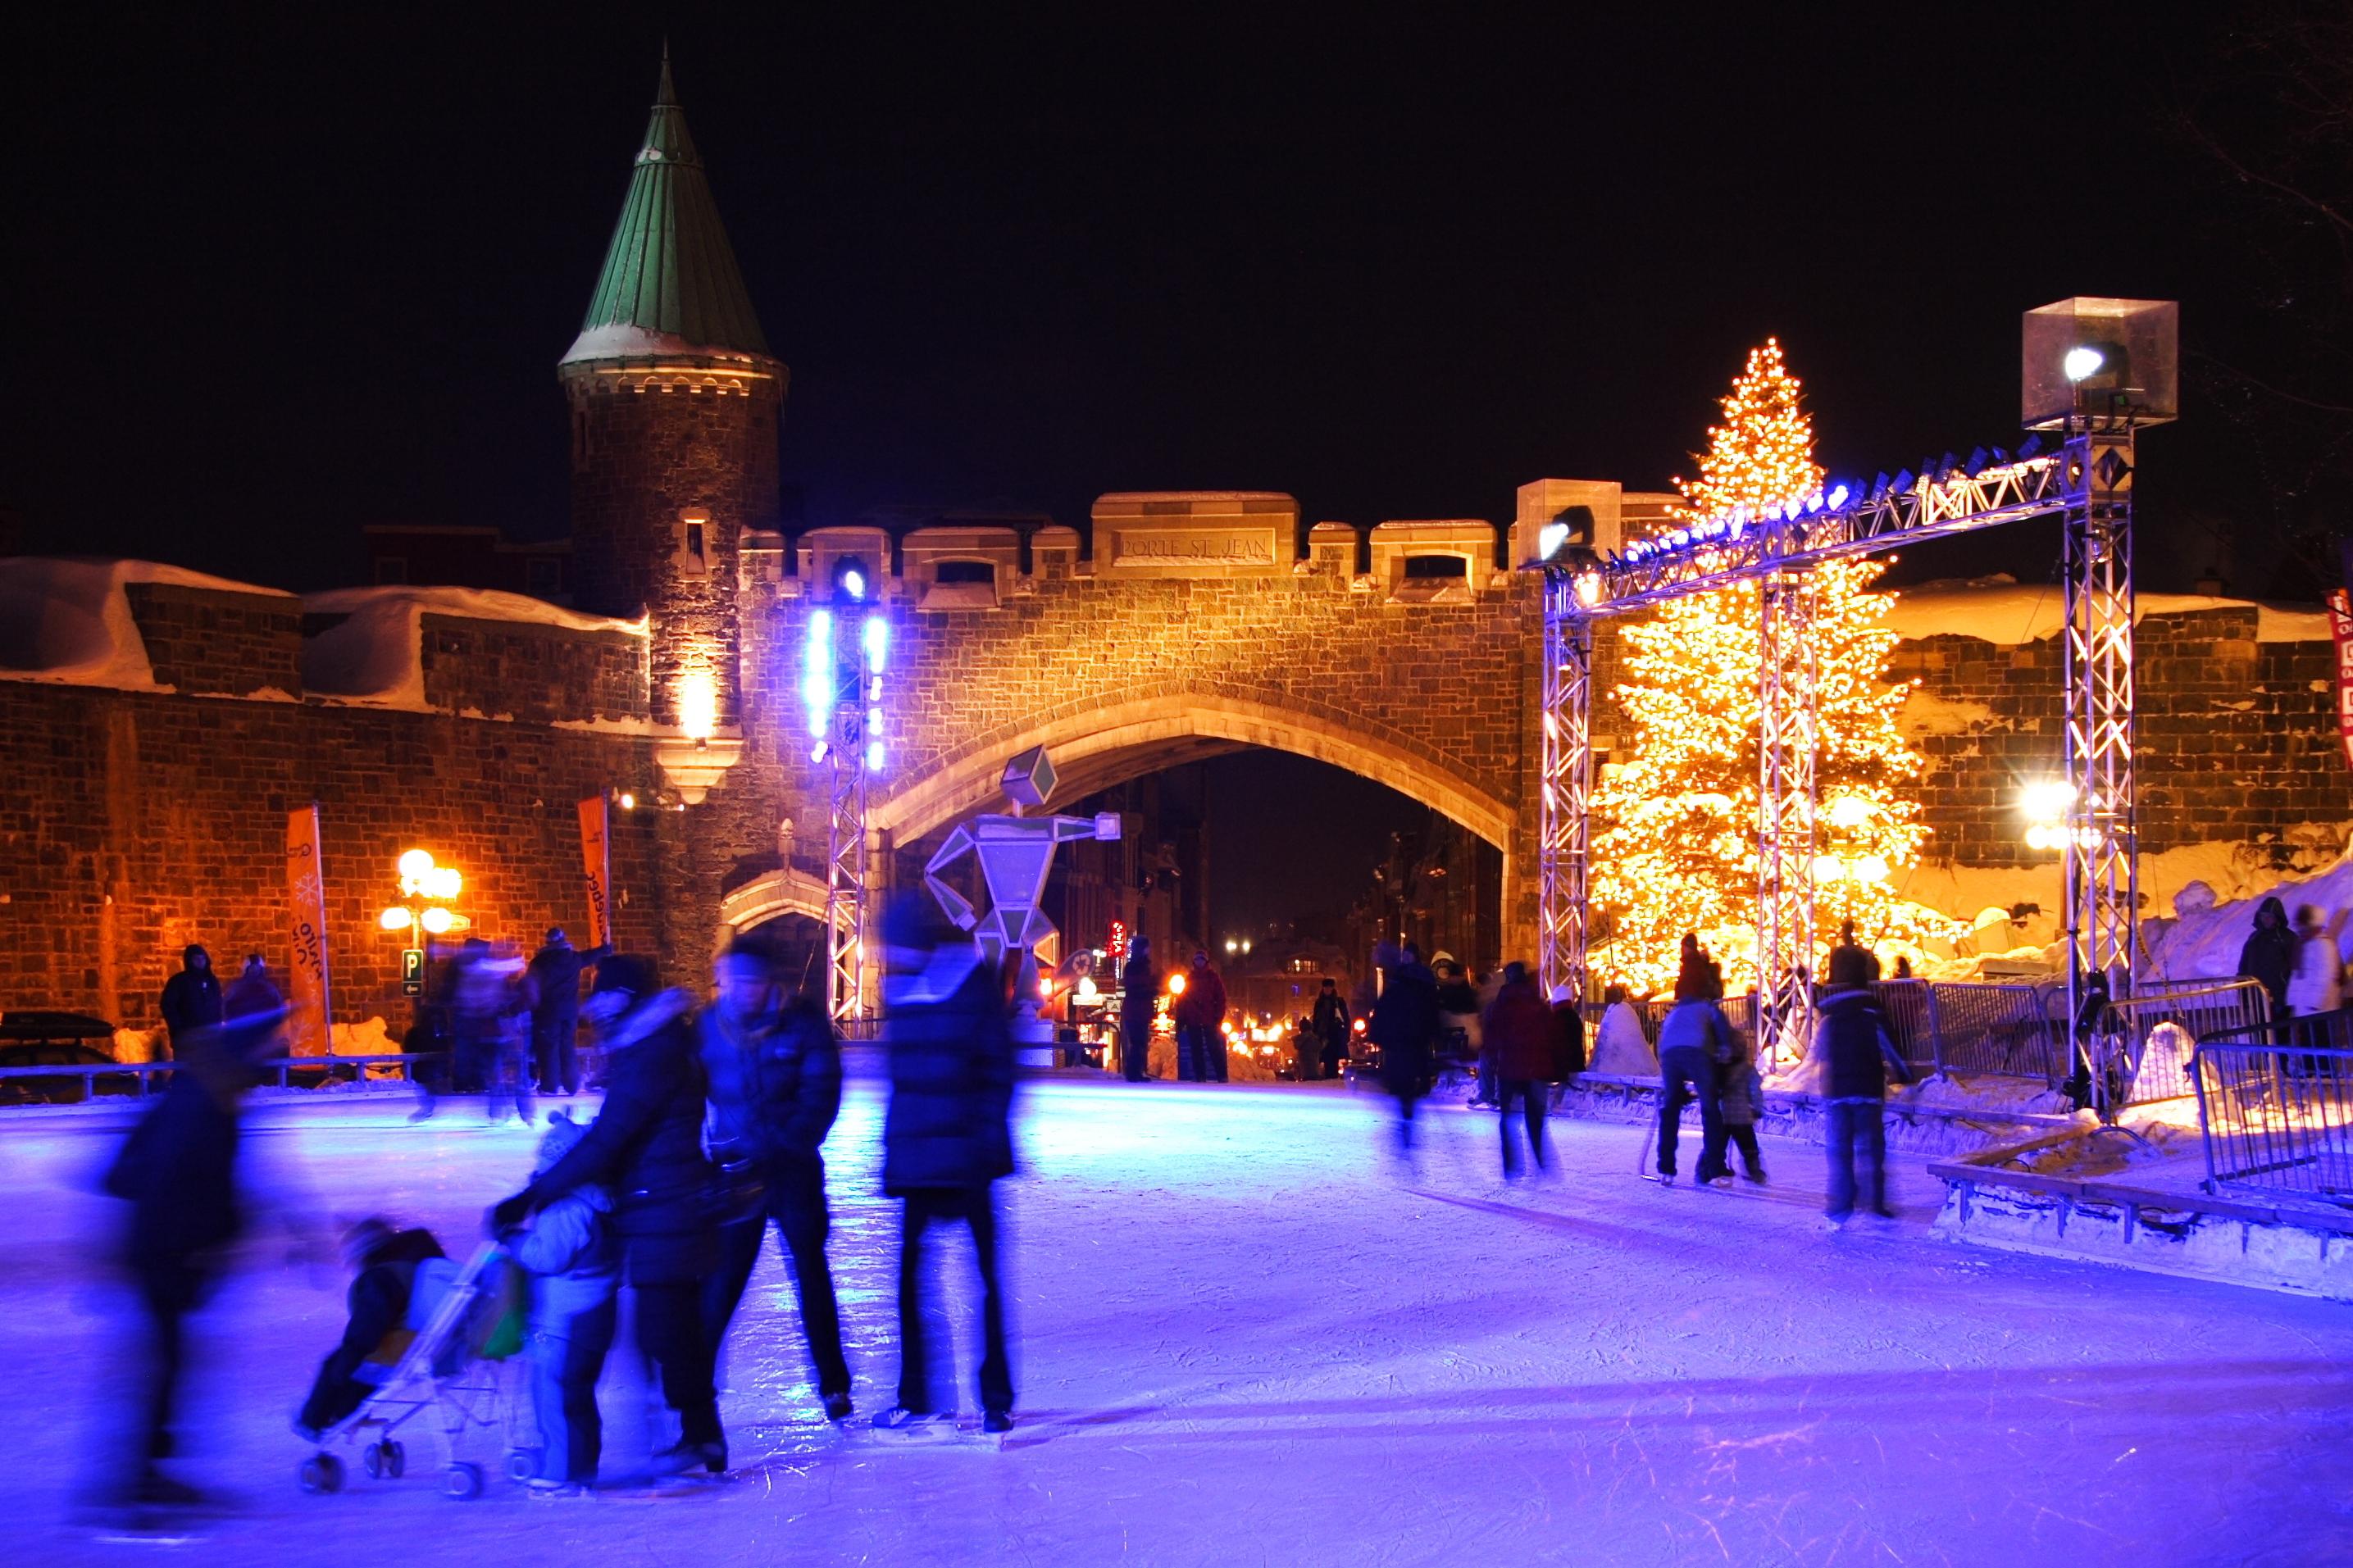 Quebec Winter Carnival via Shutterstock